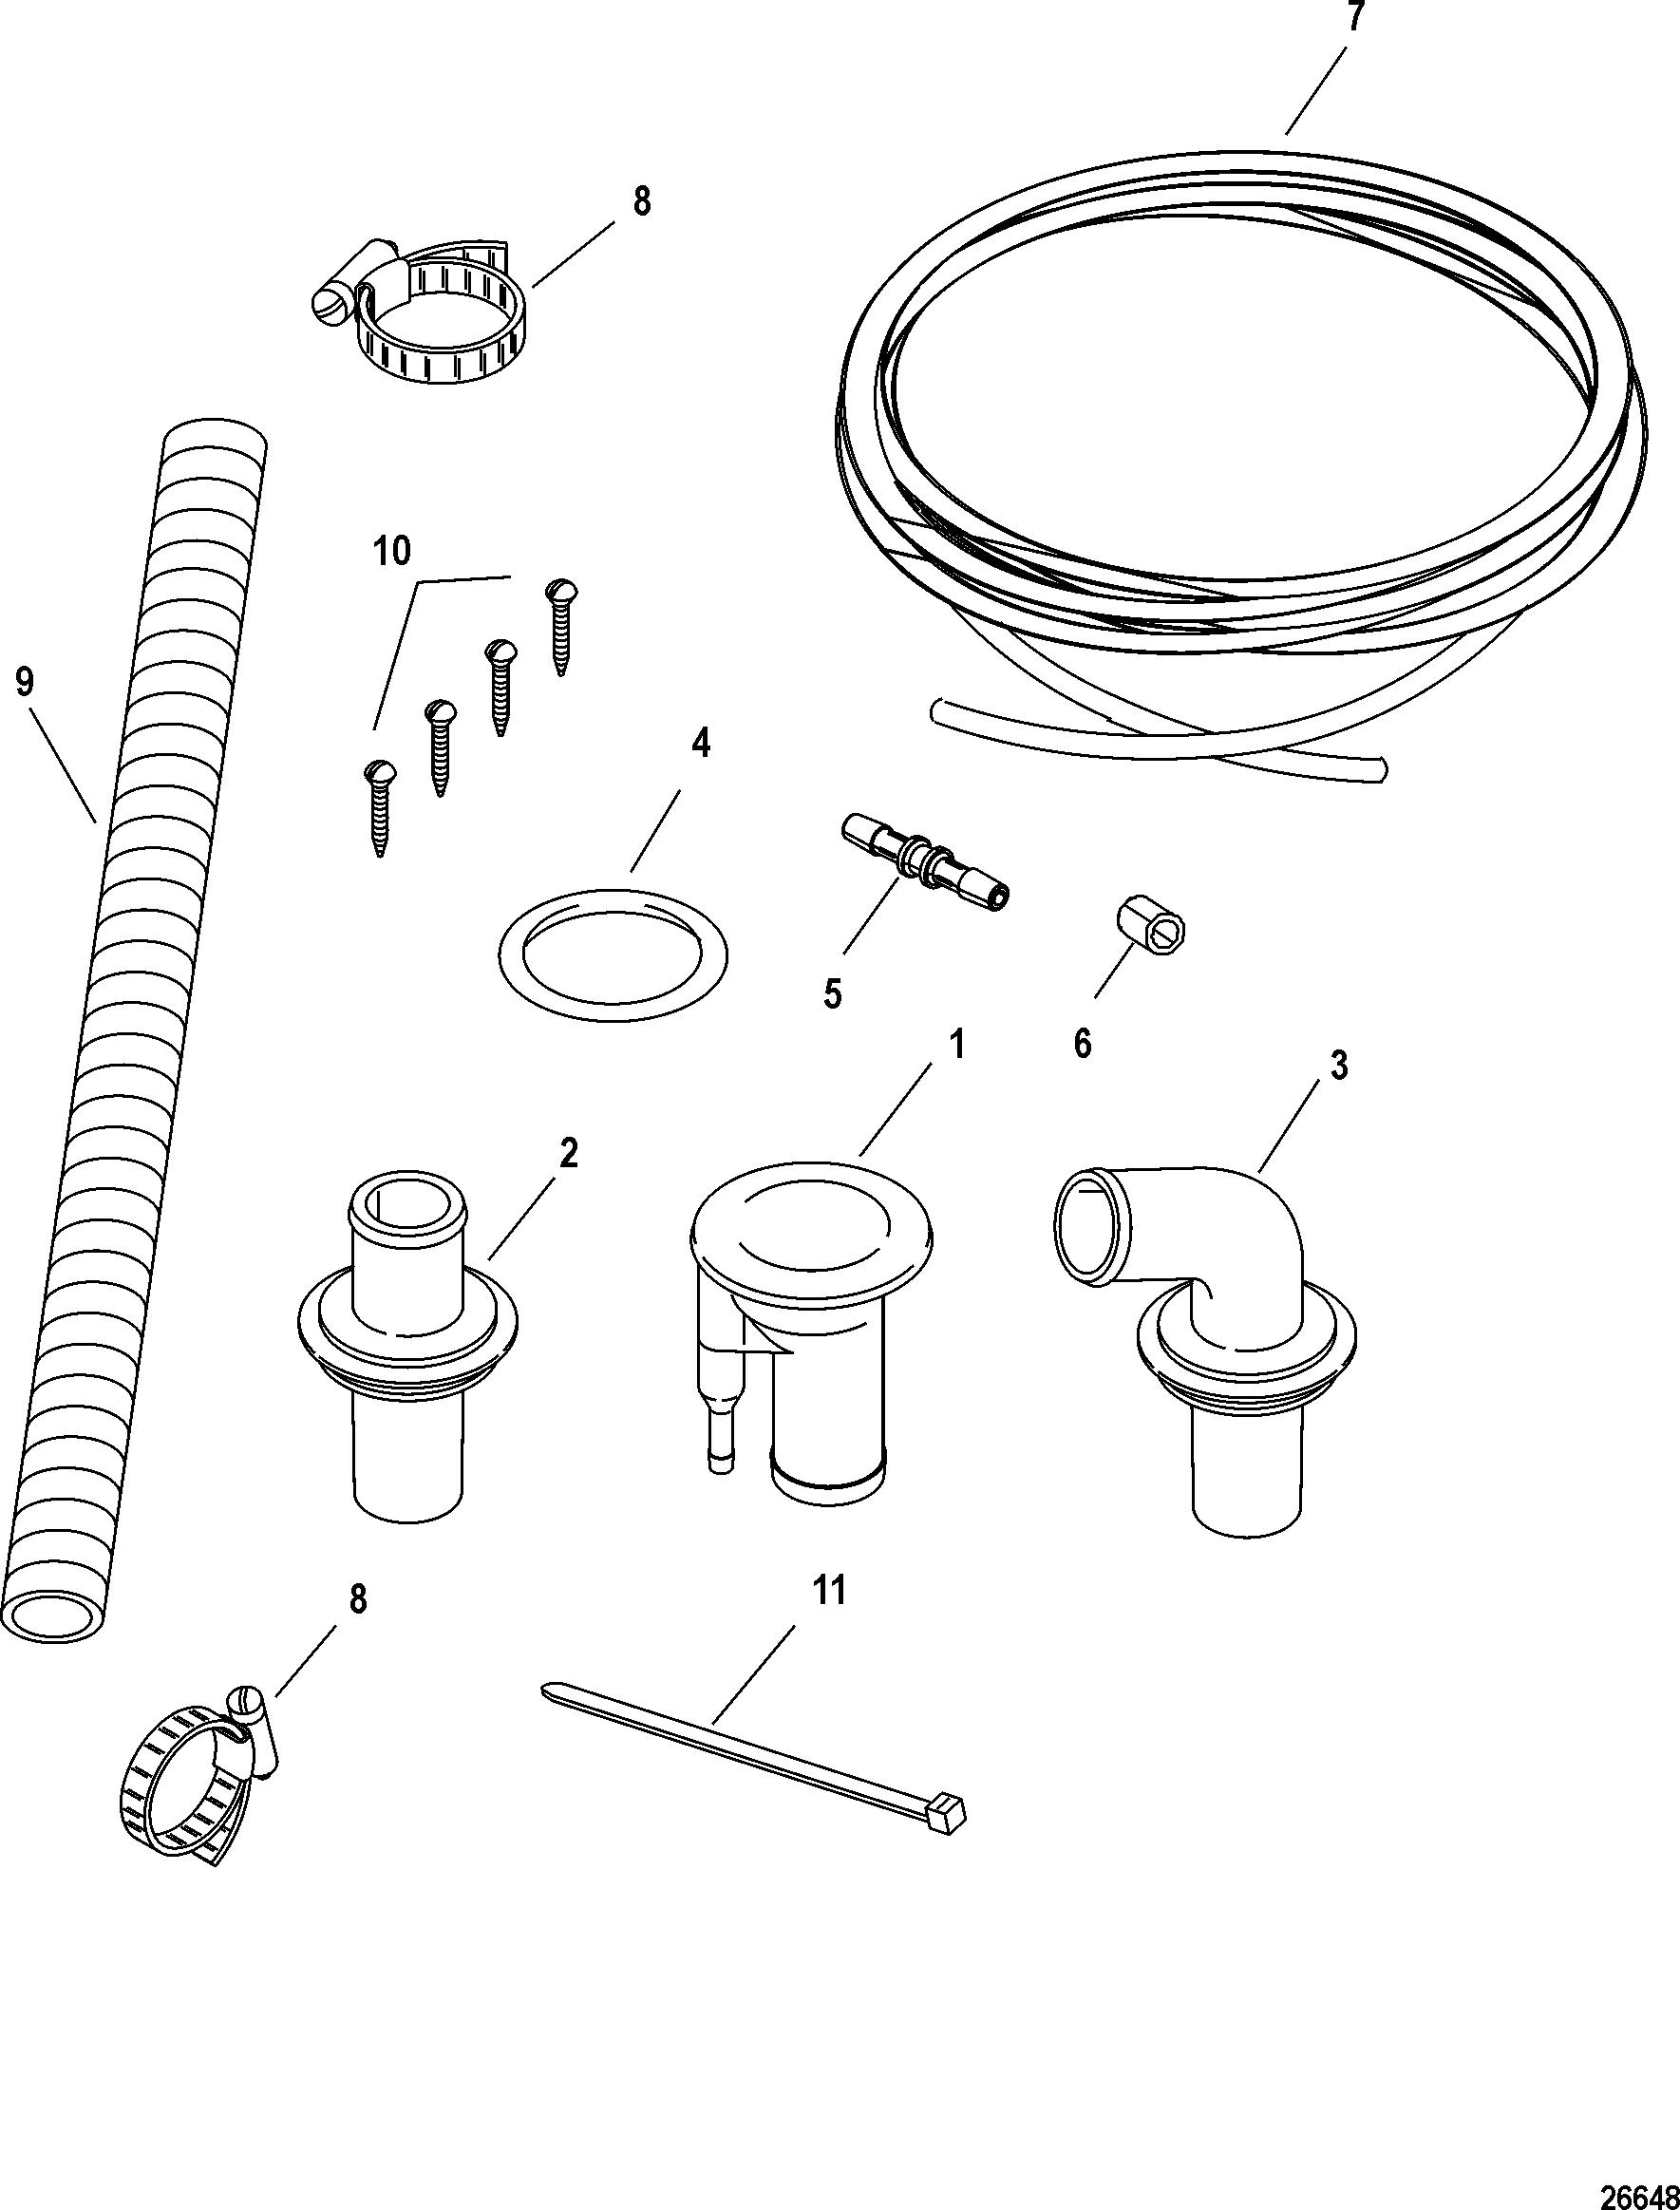 Deck Oil Fill Kit A09 10 11 13 For Fuel Oil Tanks